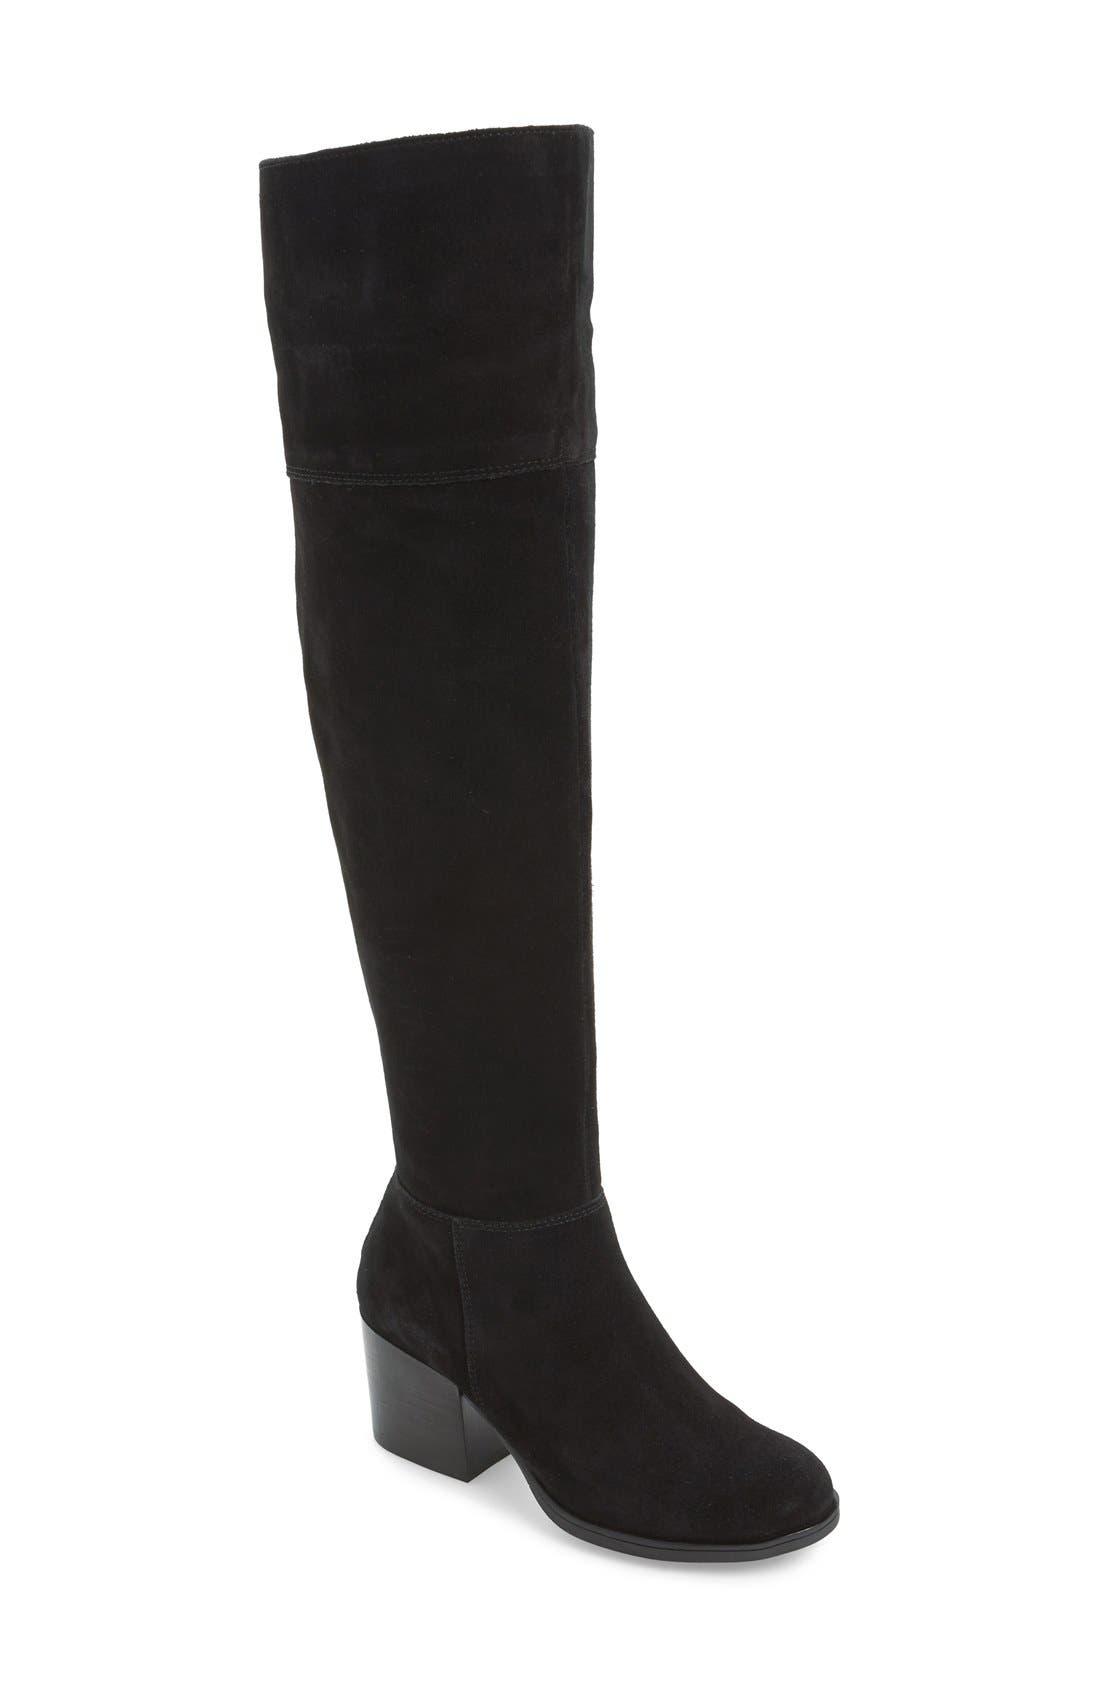 'Orabela' Knee High Boot, Main, color, 006